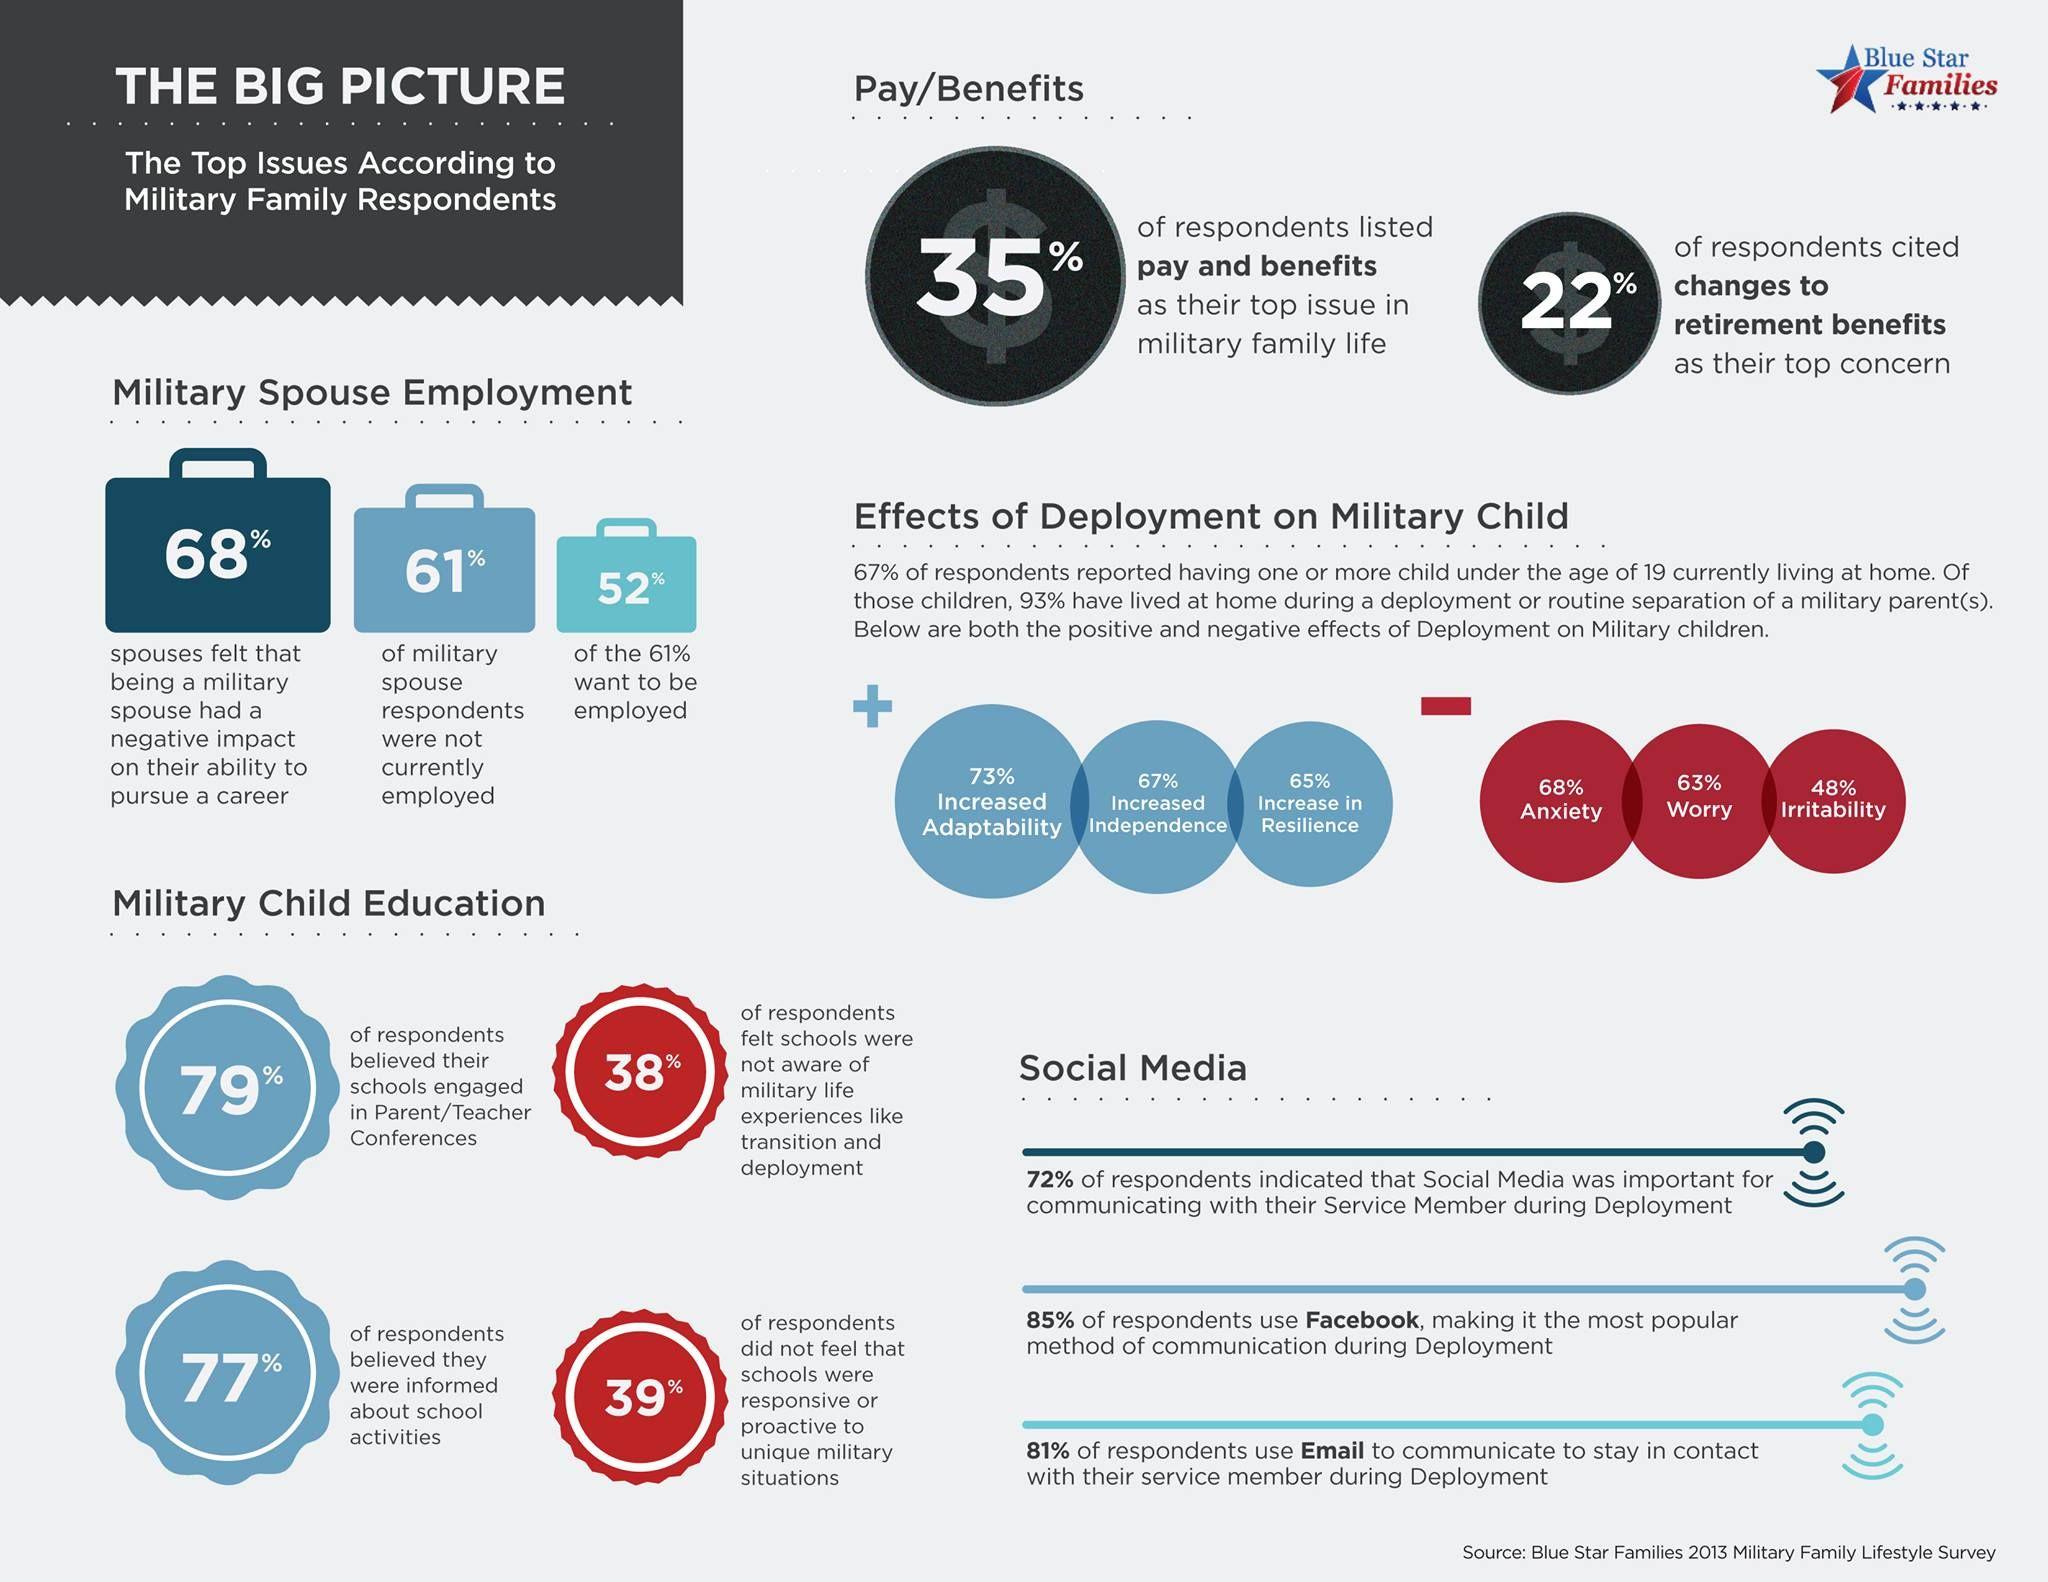 Blue Star Families 2013 Military Family Lifestyle Survey